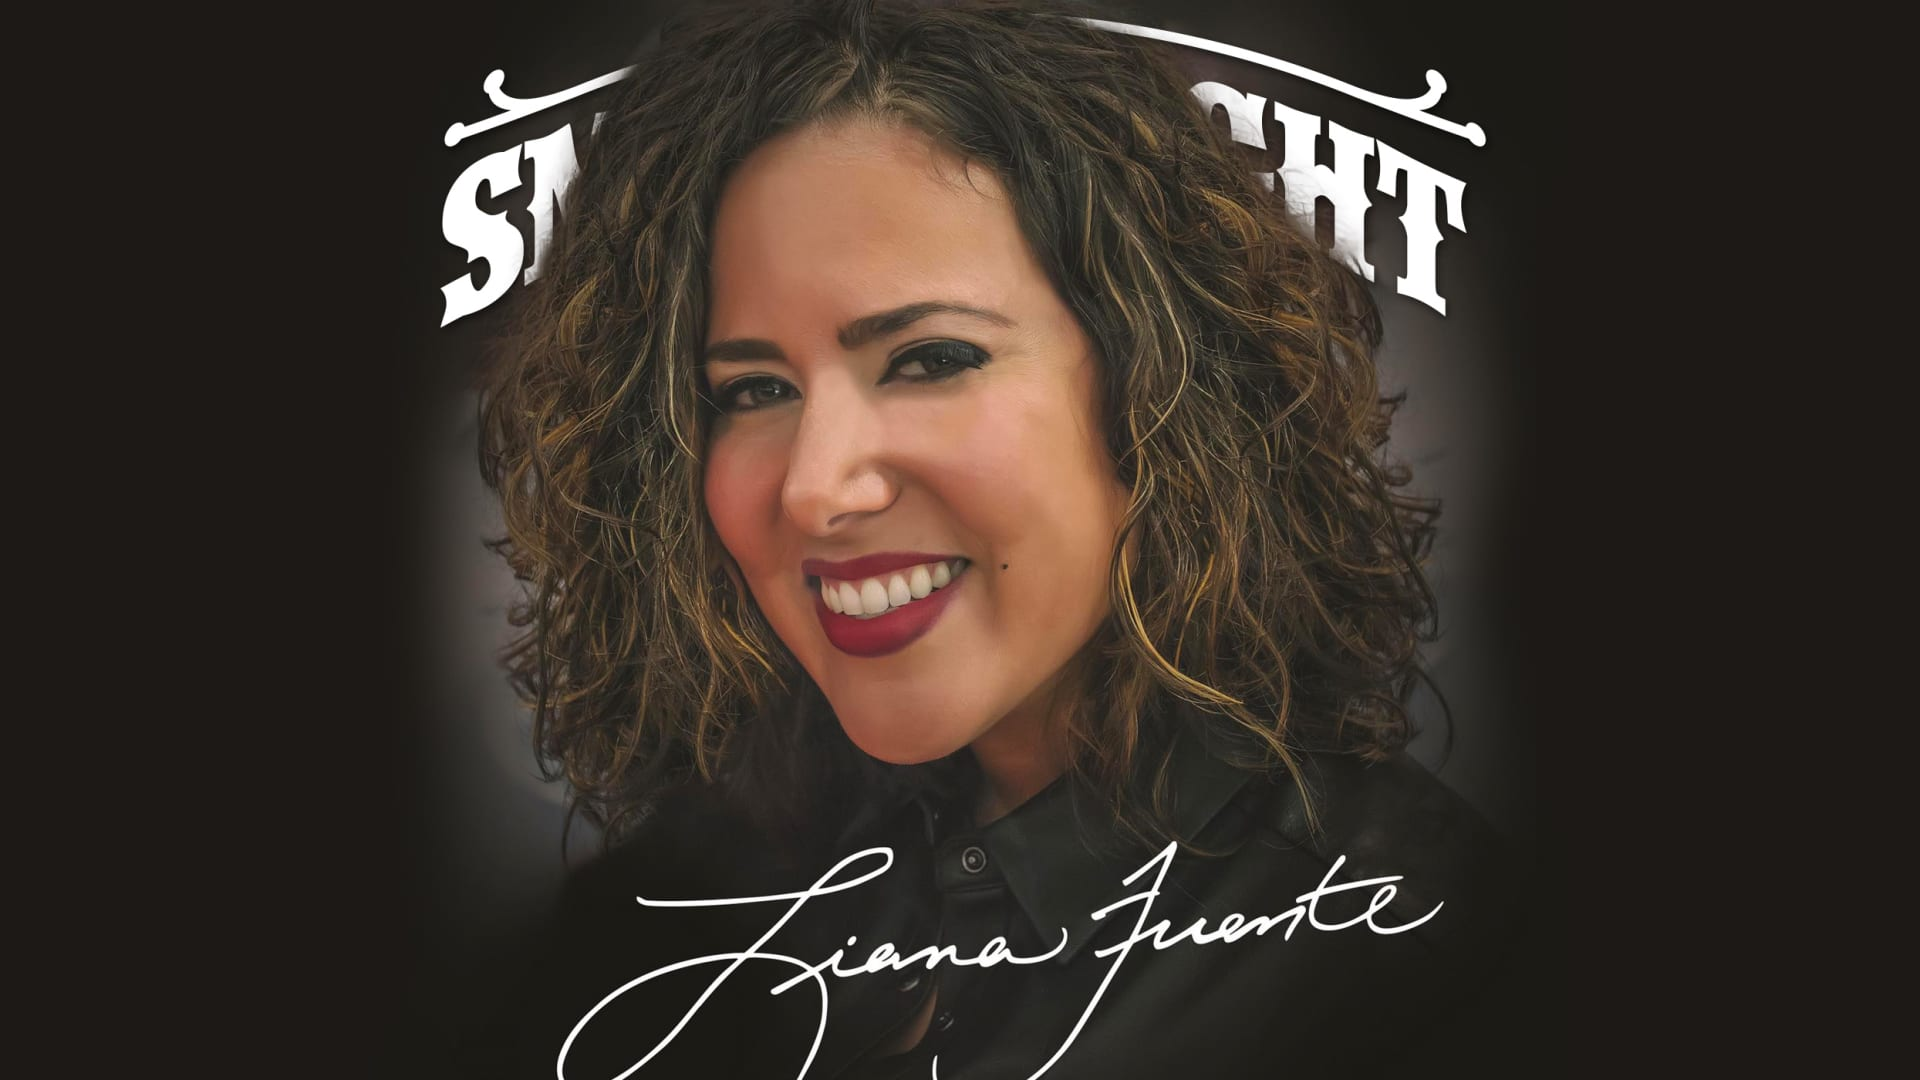 Smoke Night LIVE – Liana Fuente from Arturo Fuente Featured Image